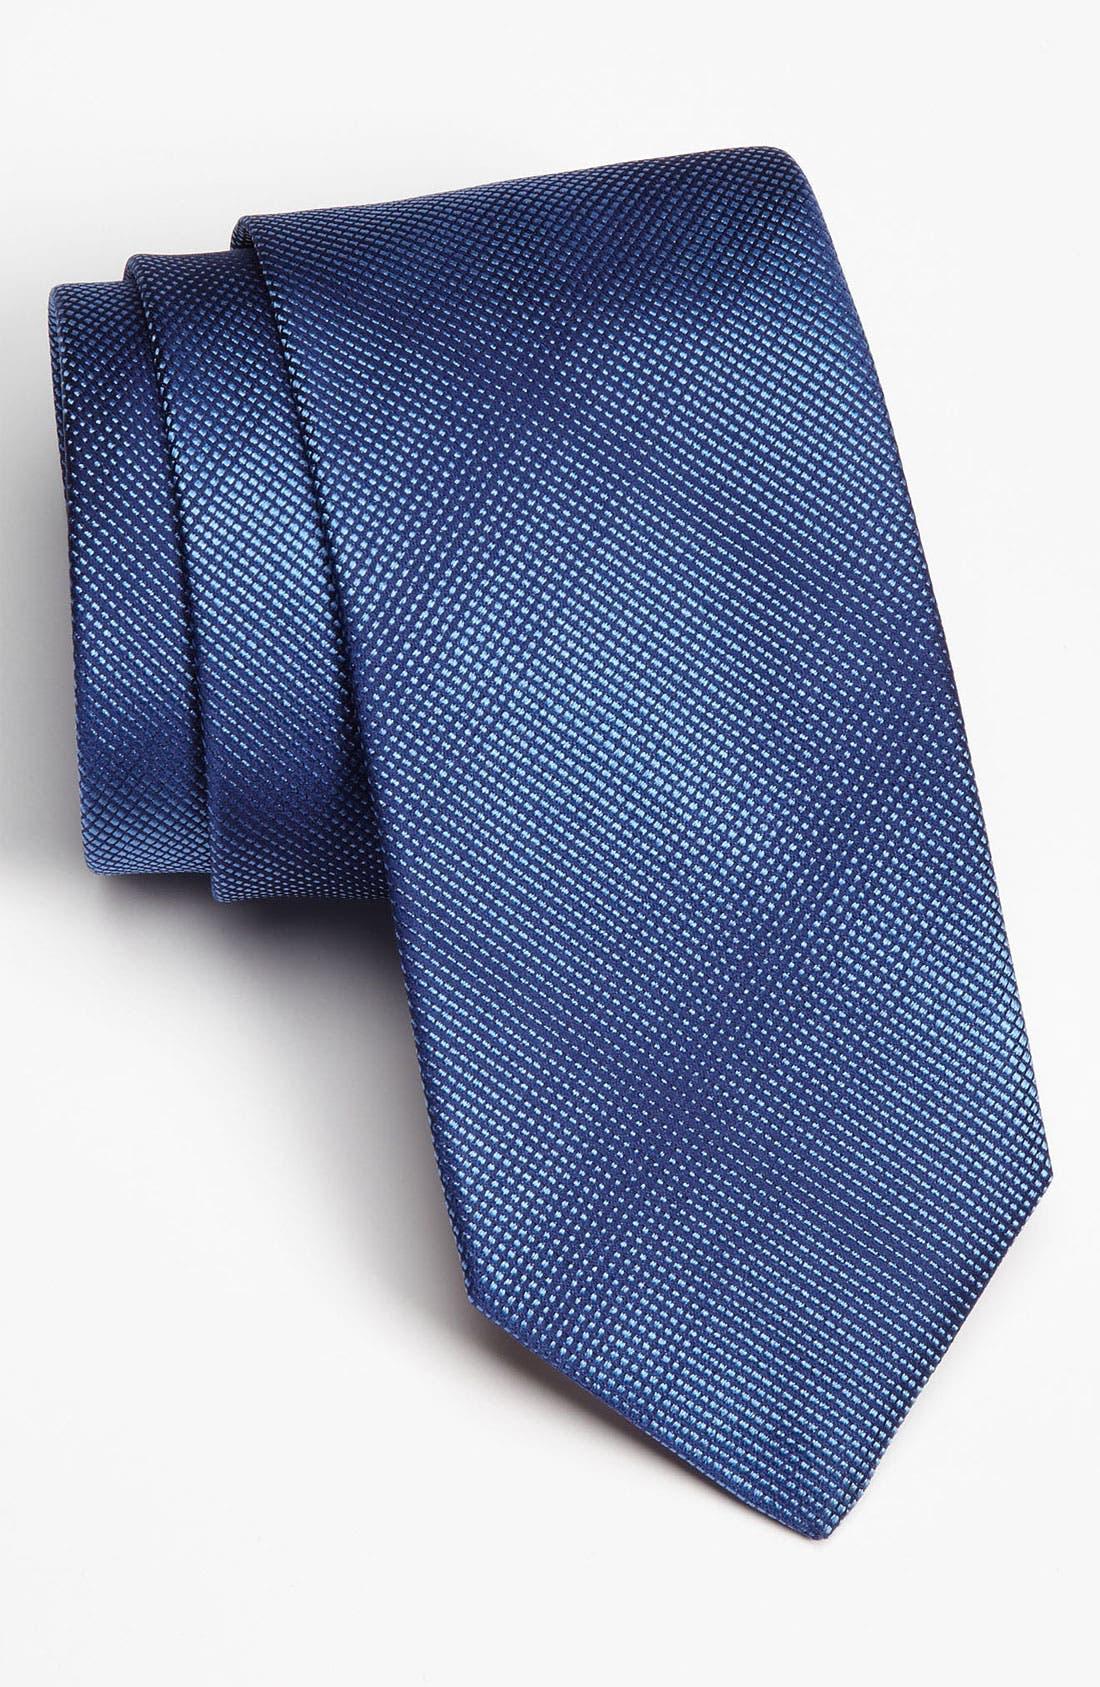 Alternate Image 1 Selected - Thomas Pink Woven Silk Tie